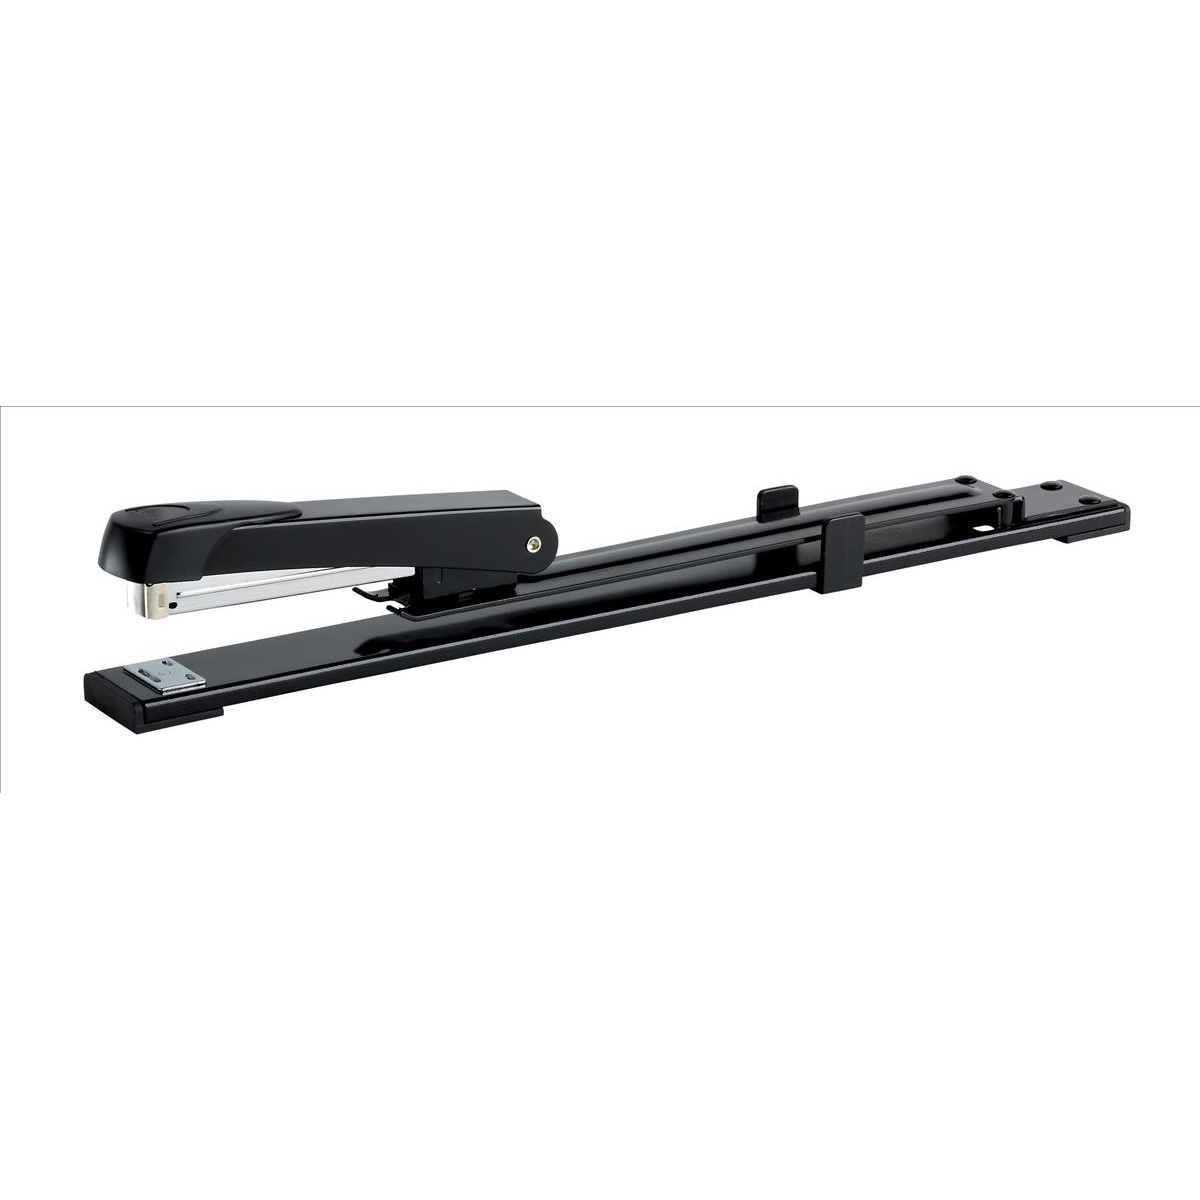 Rexel Long Reach Stapler 26/6 24/6 Staples Pins & Tacks 308mm Throat 15 Sheet Capacity Black Ref 01026